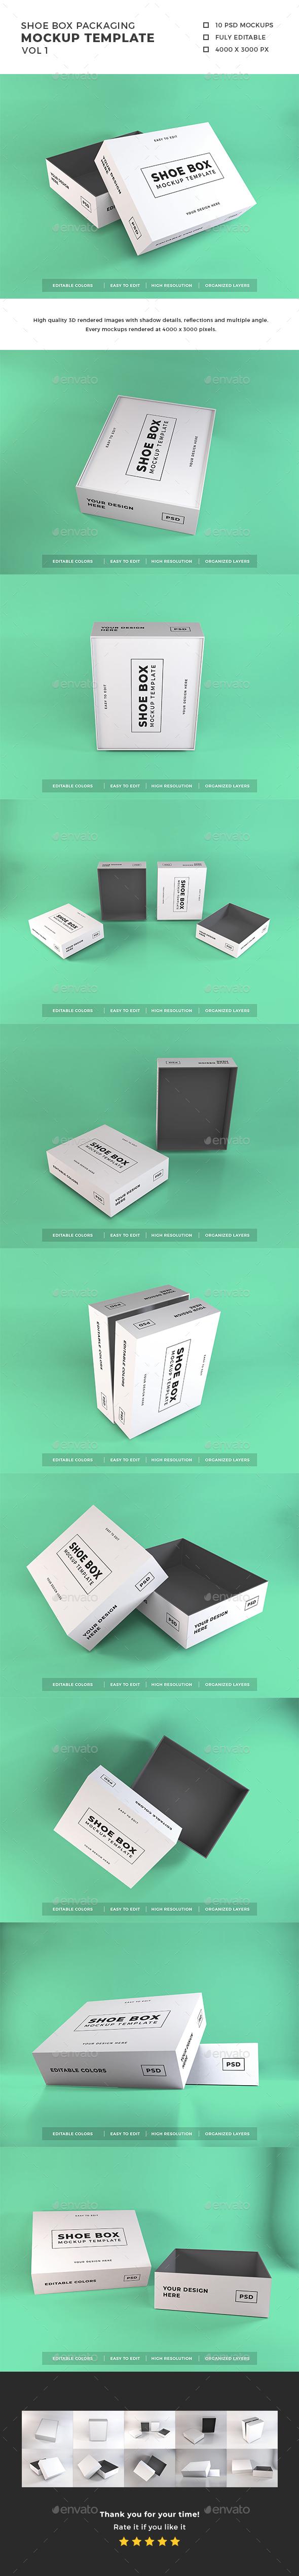 Shoe Box Packaging Mockup Template Vol 1